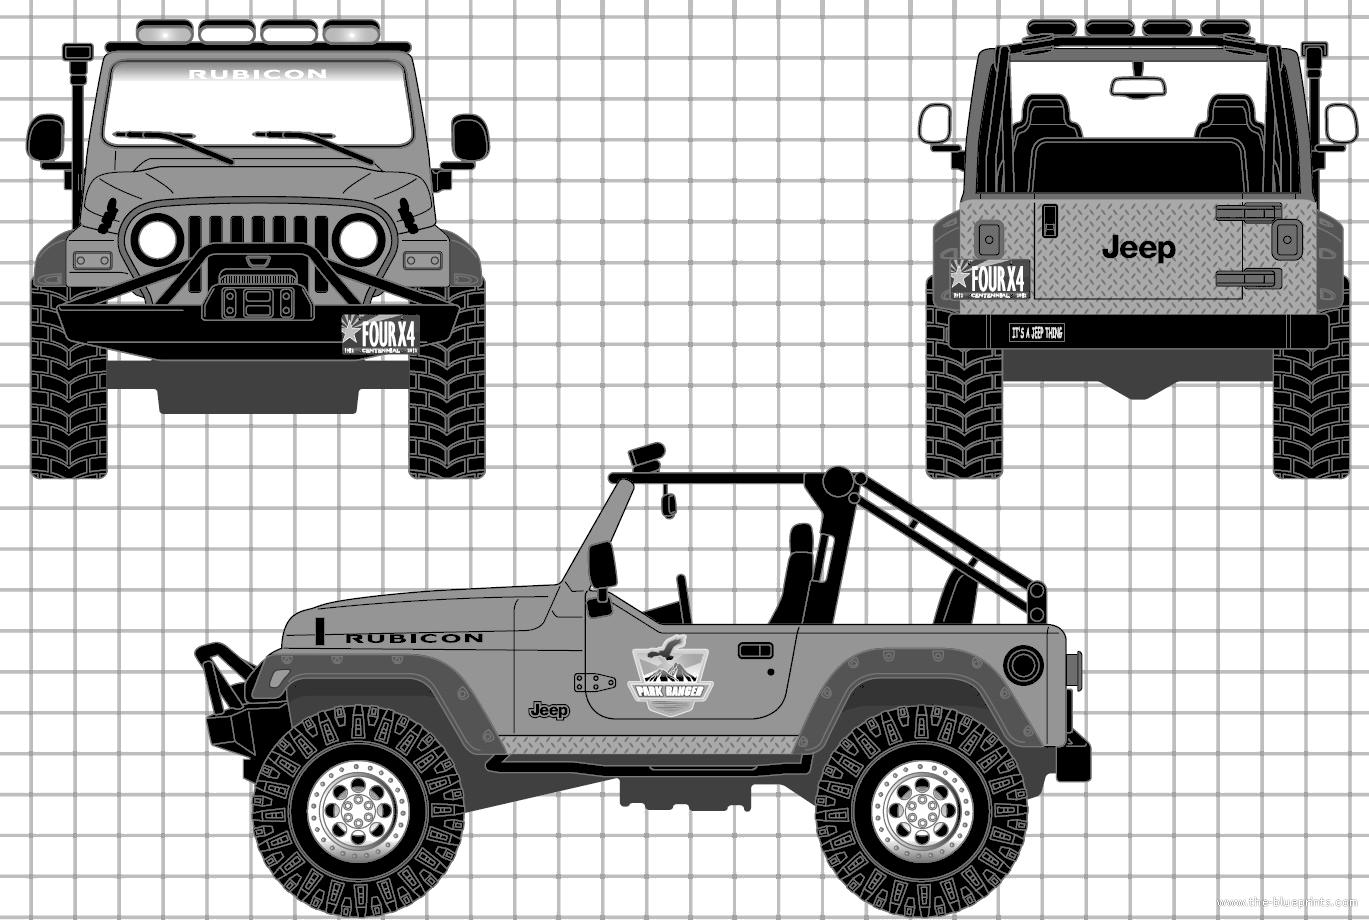 Ausmalbilder Auto Jeep : Blueprint Militar Buscar Con Google Cartoons Pinterest Jeeps